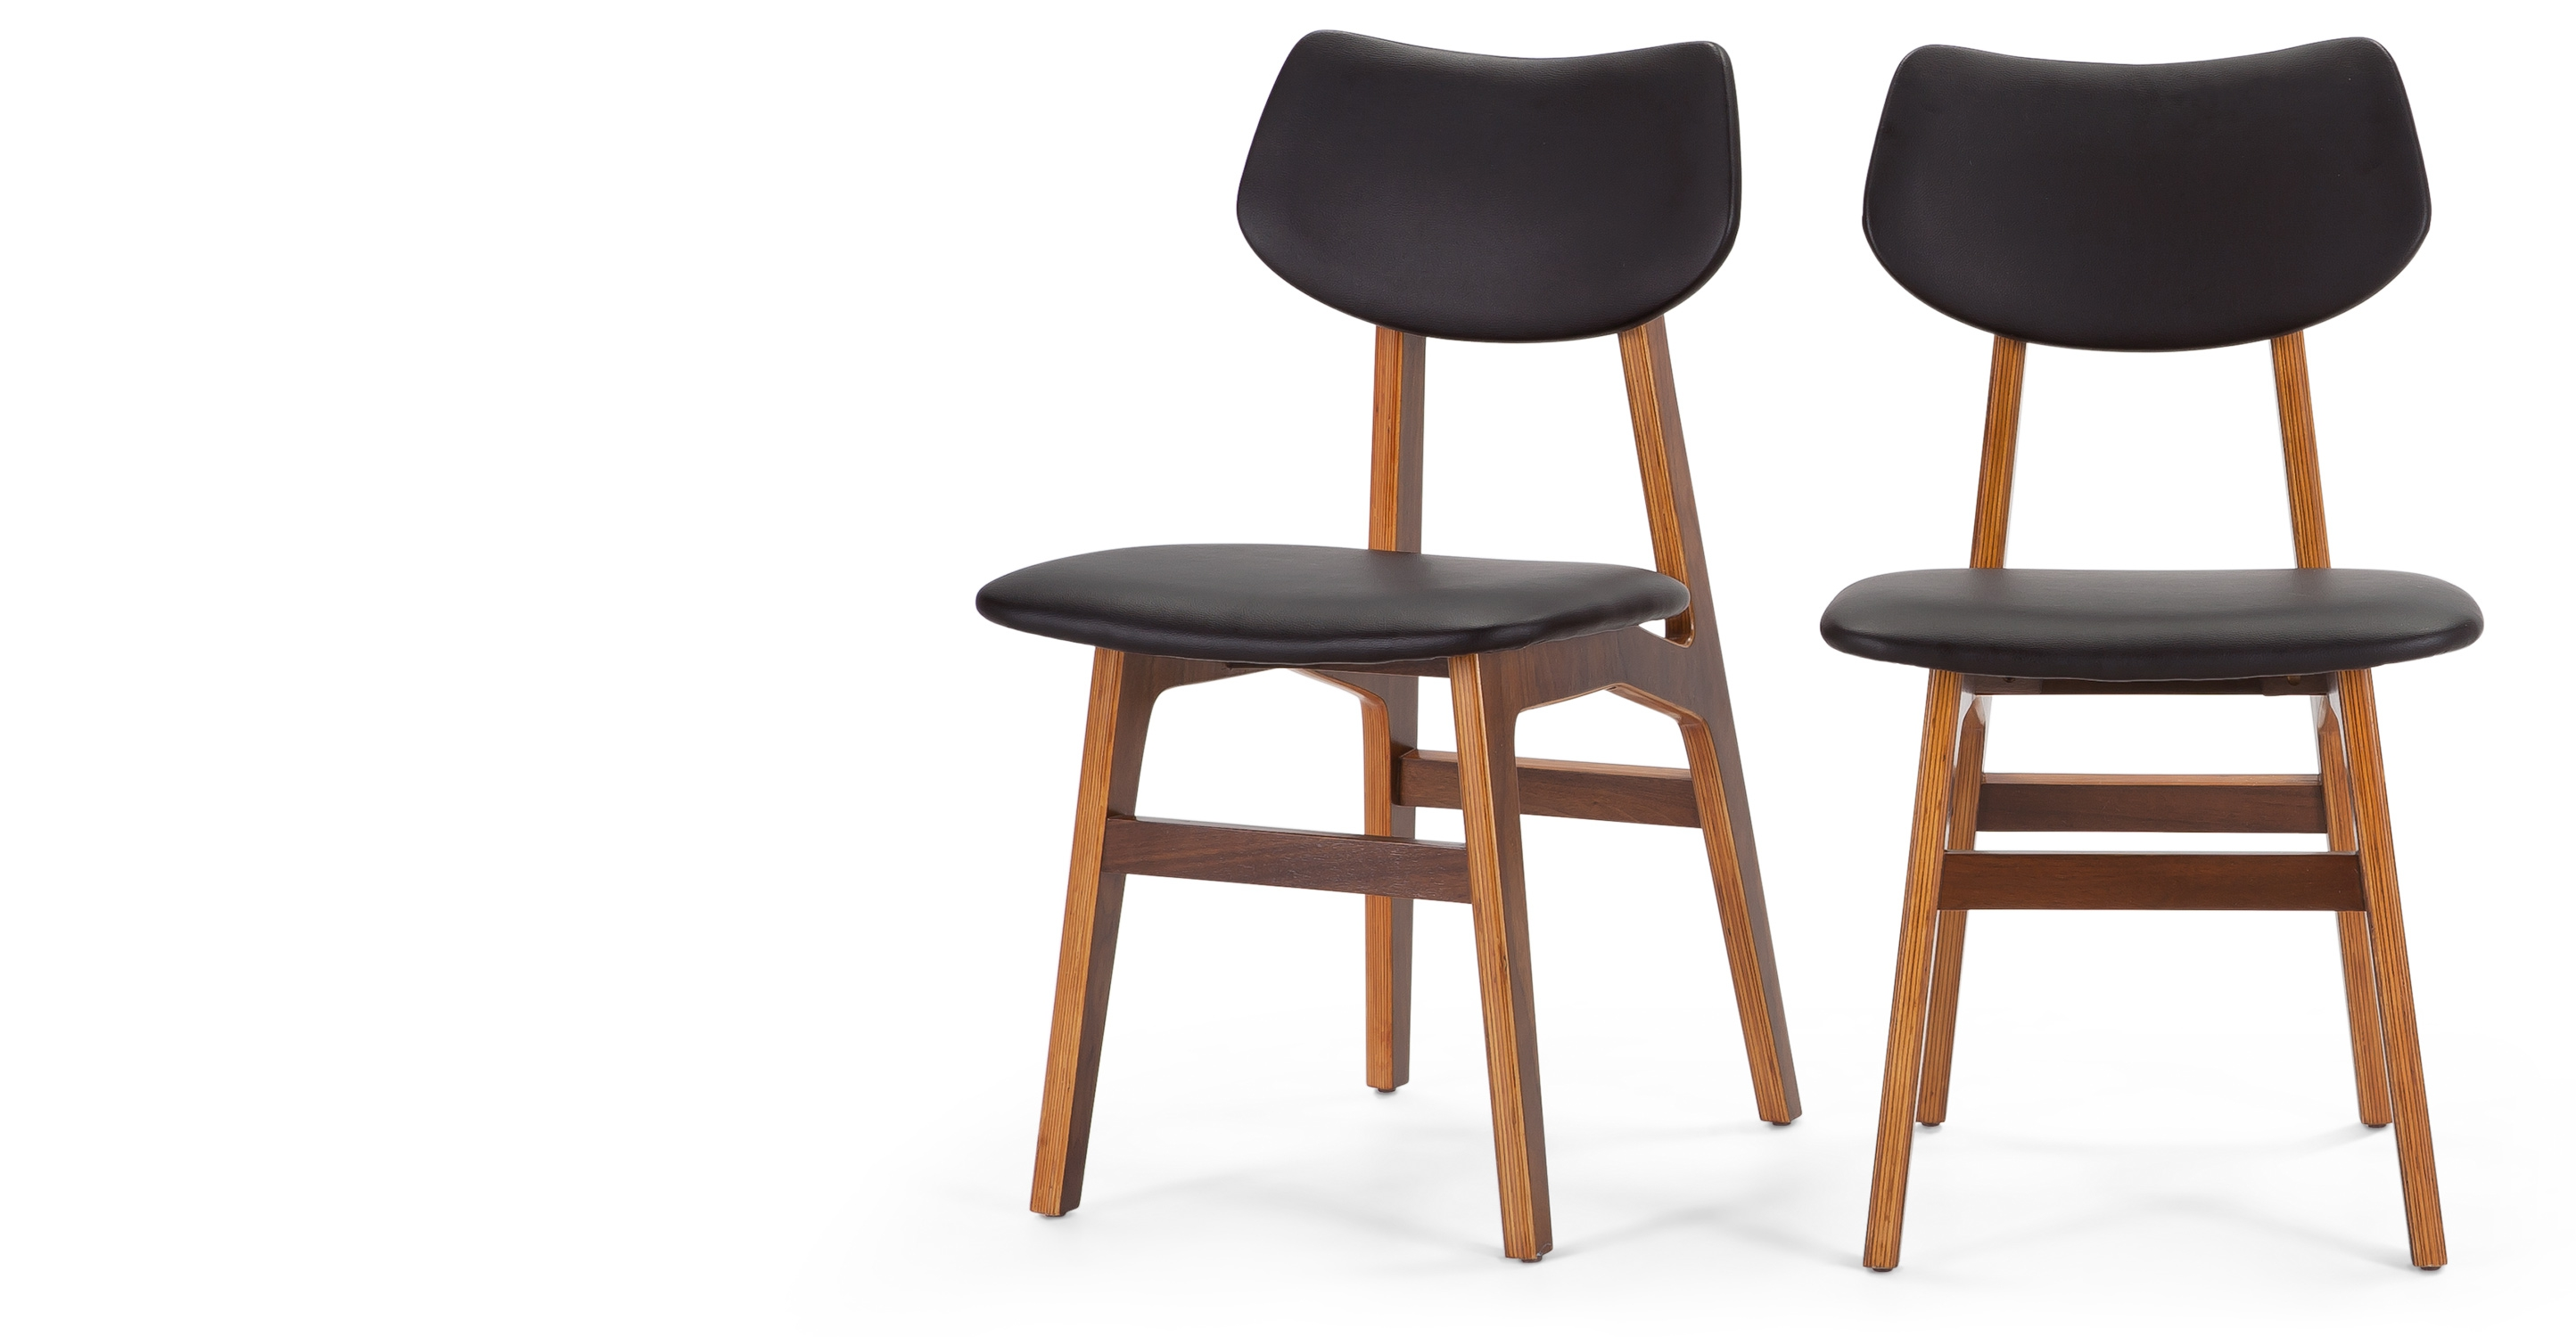 Stoelen kwantum stunning good leen bakker corelli rieten stoelen